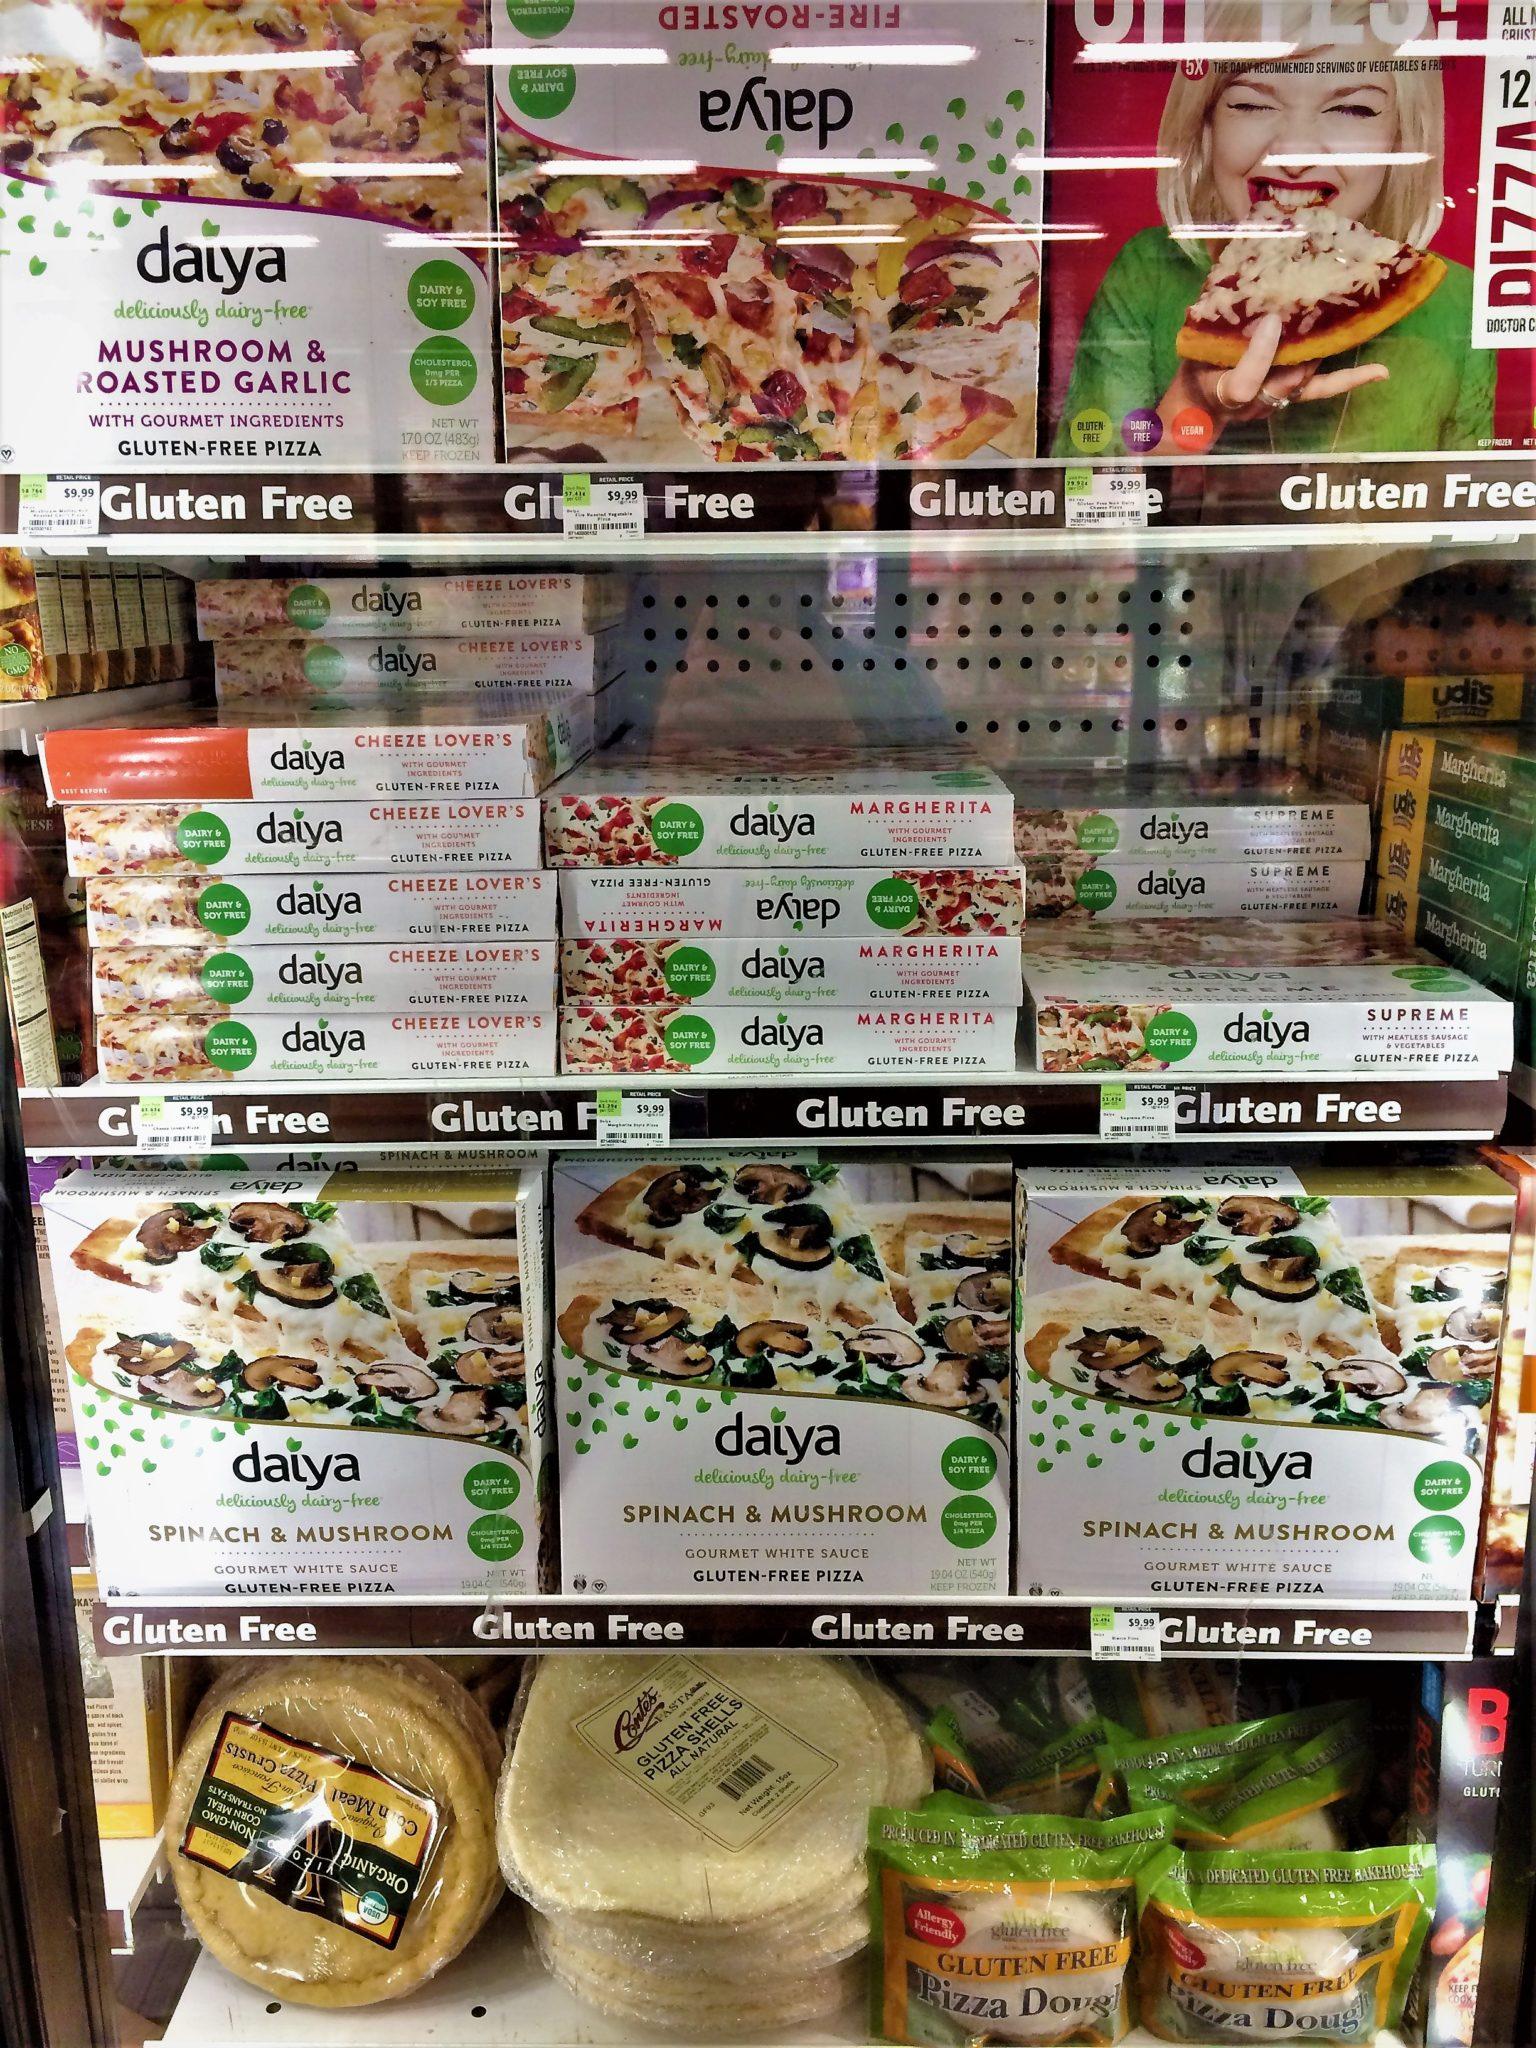 Vegan freezer section, Whole foods, los angeles